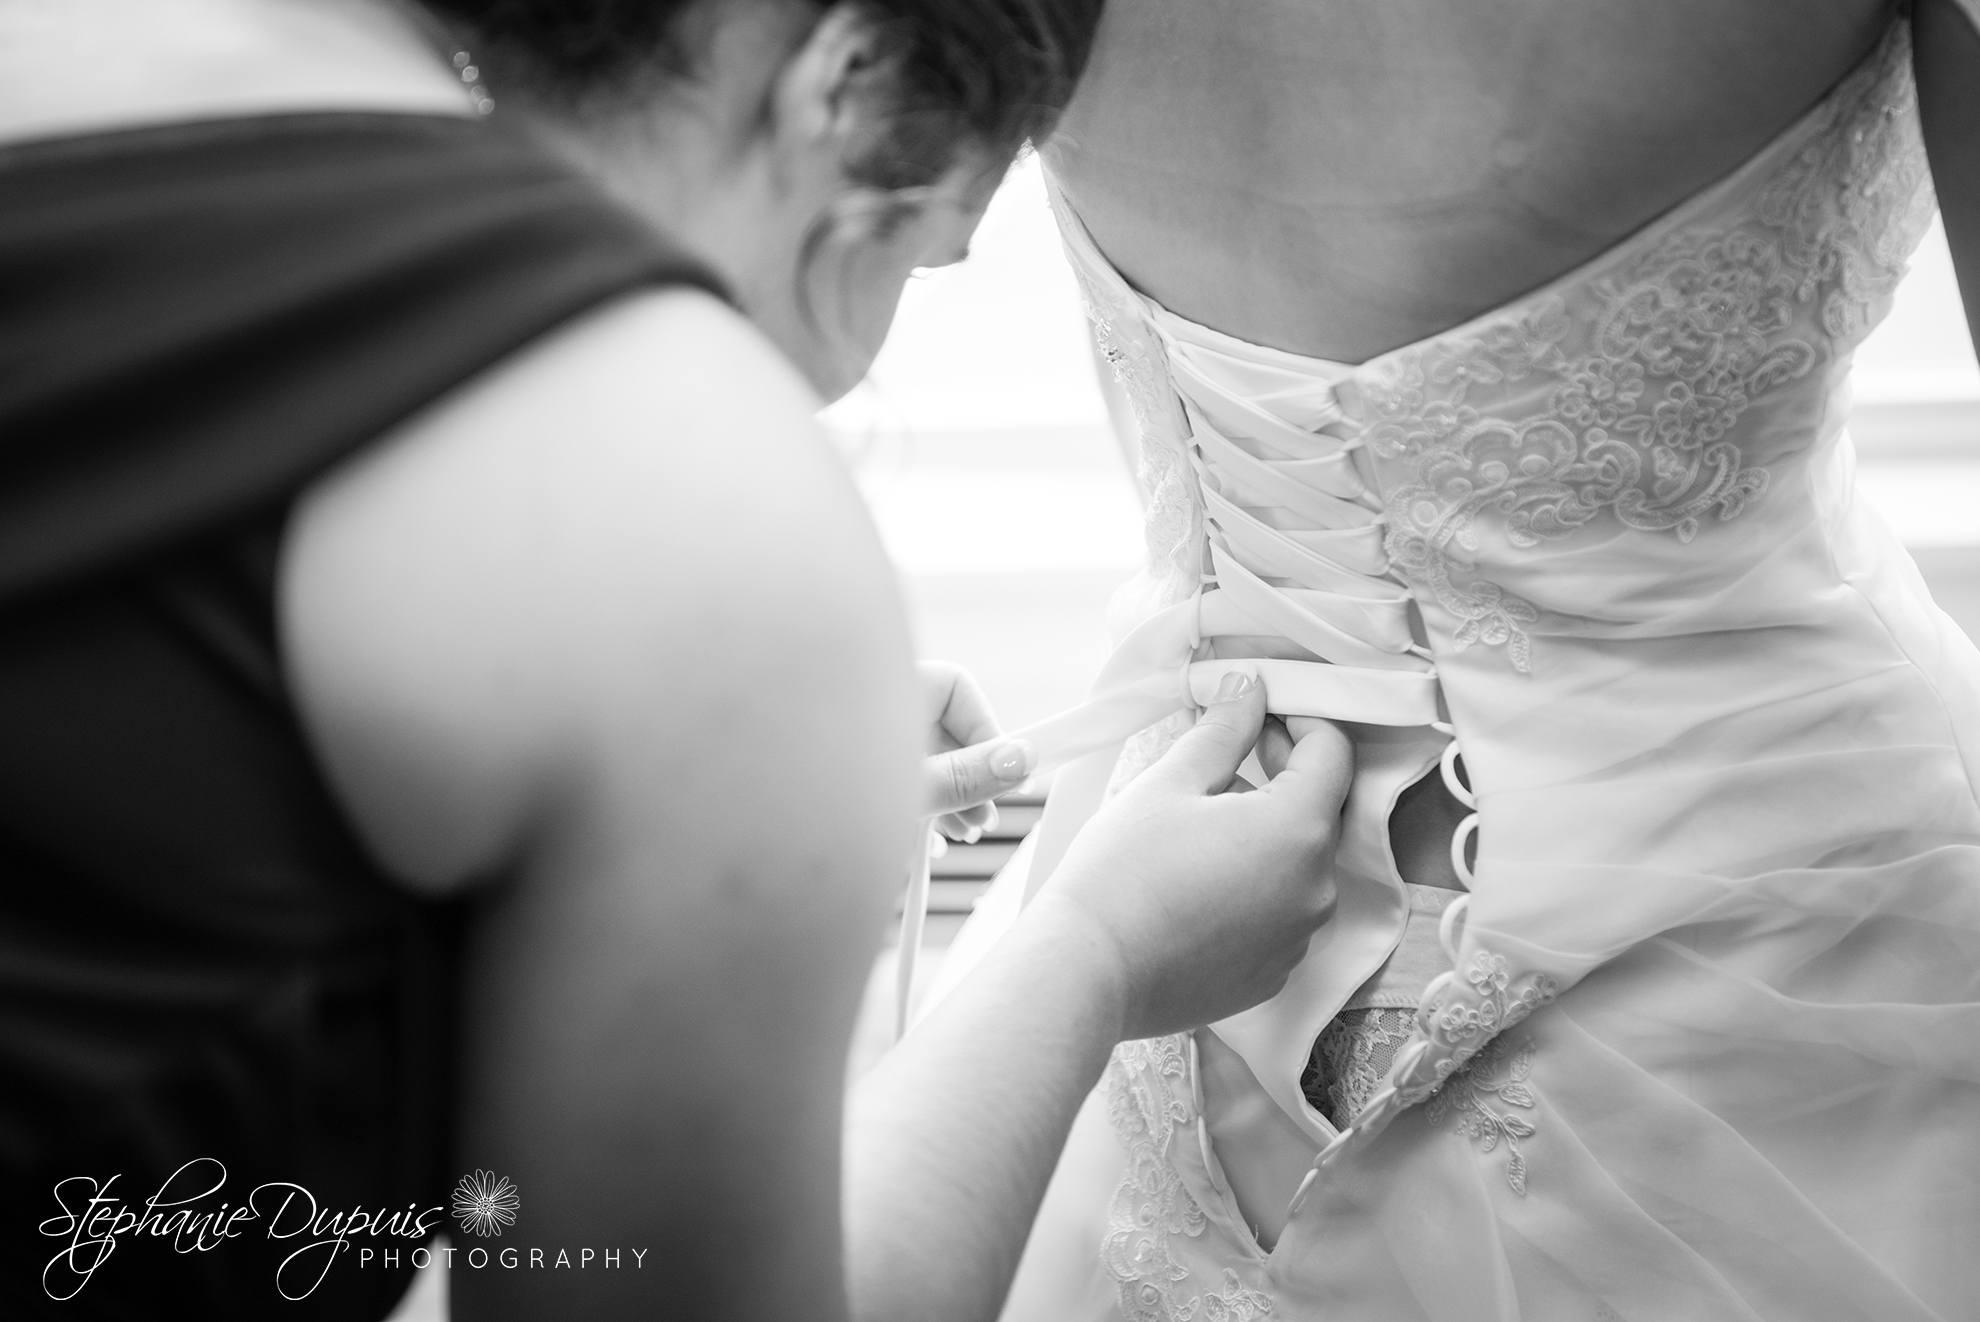 Berlin Wedding Photographer 02 1 - Portfolio: Ward Wedding